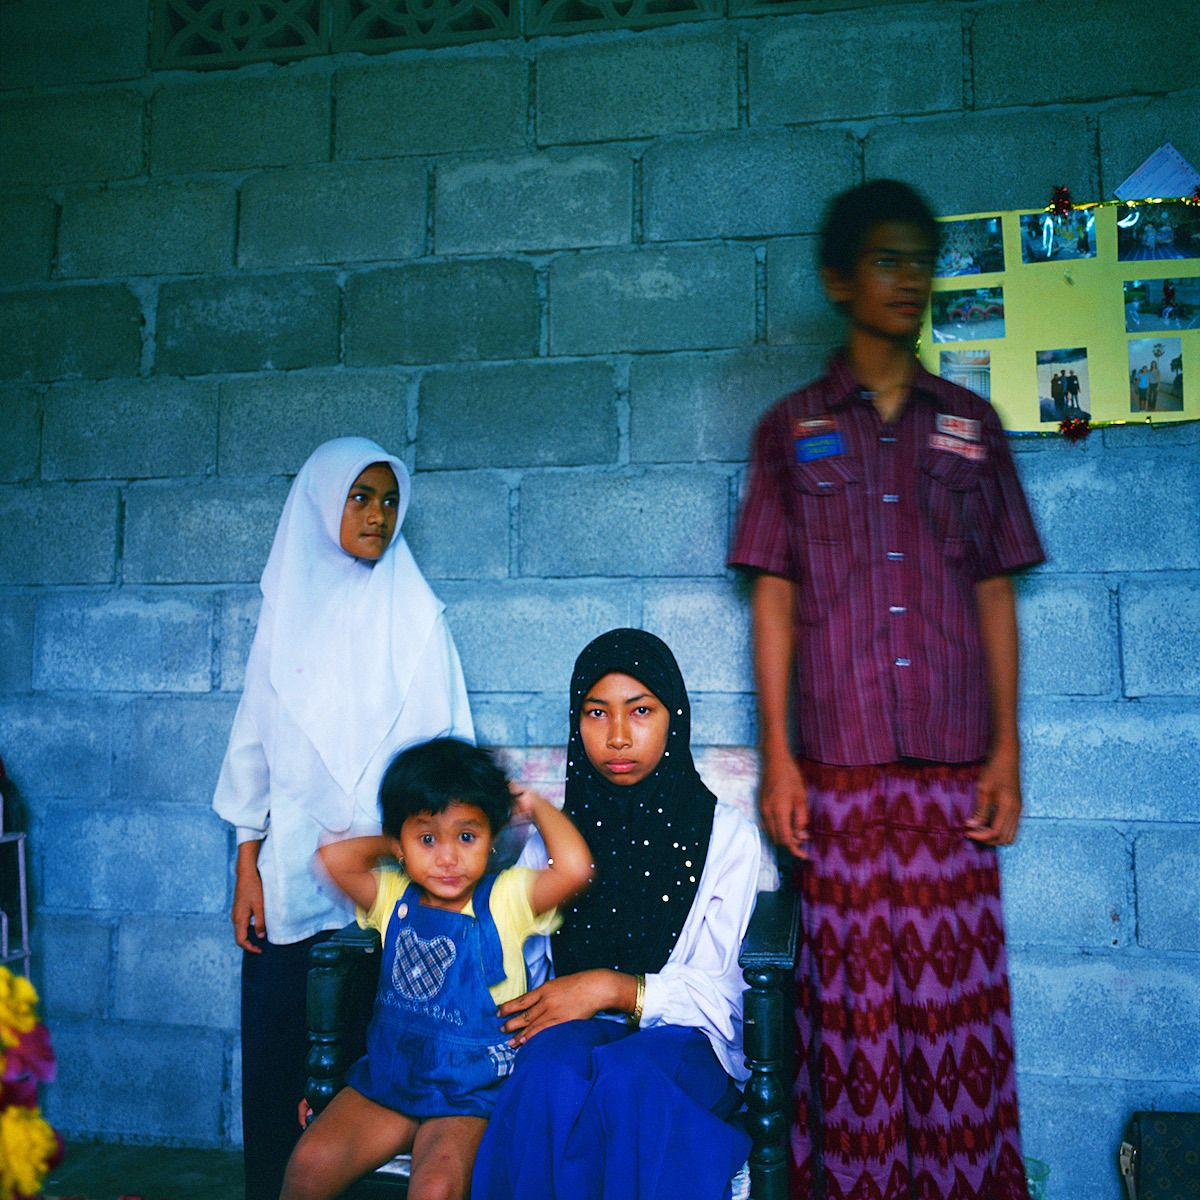 Lost father. Niran, age 10. Nisa, age 9.Nida, age 6. Nifitra, age 3.